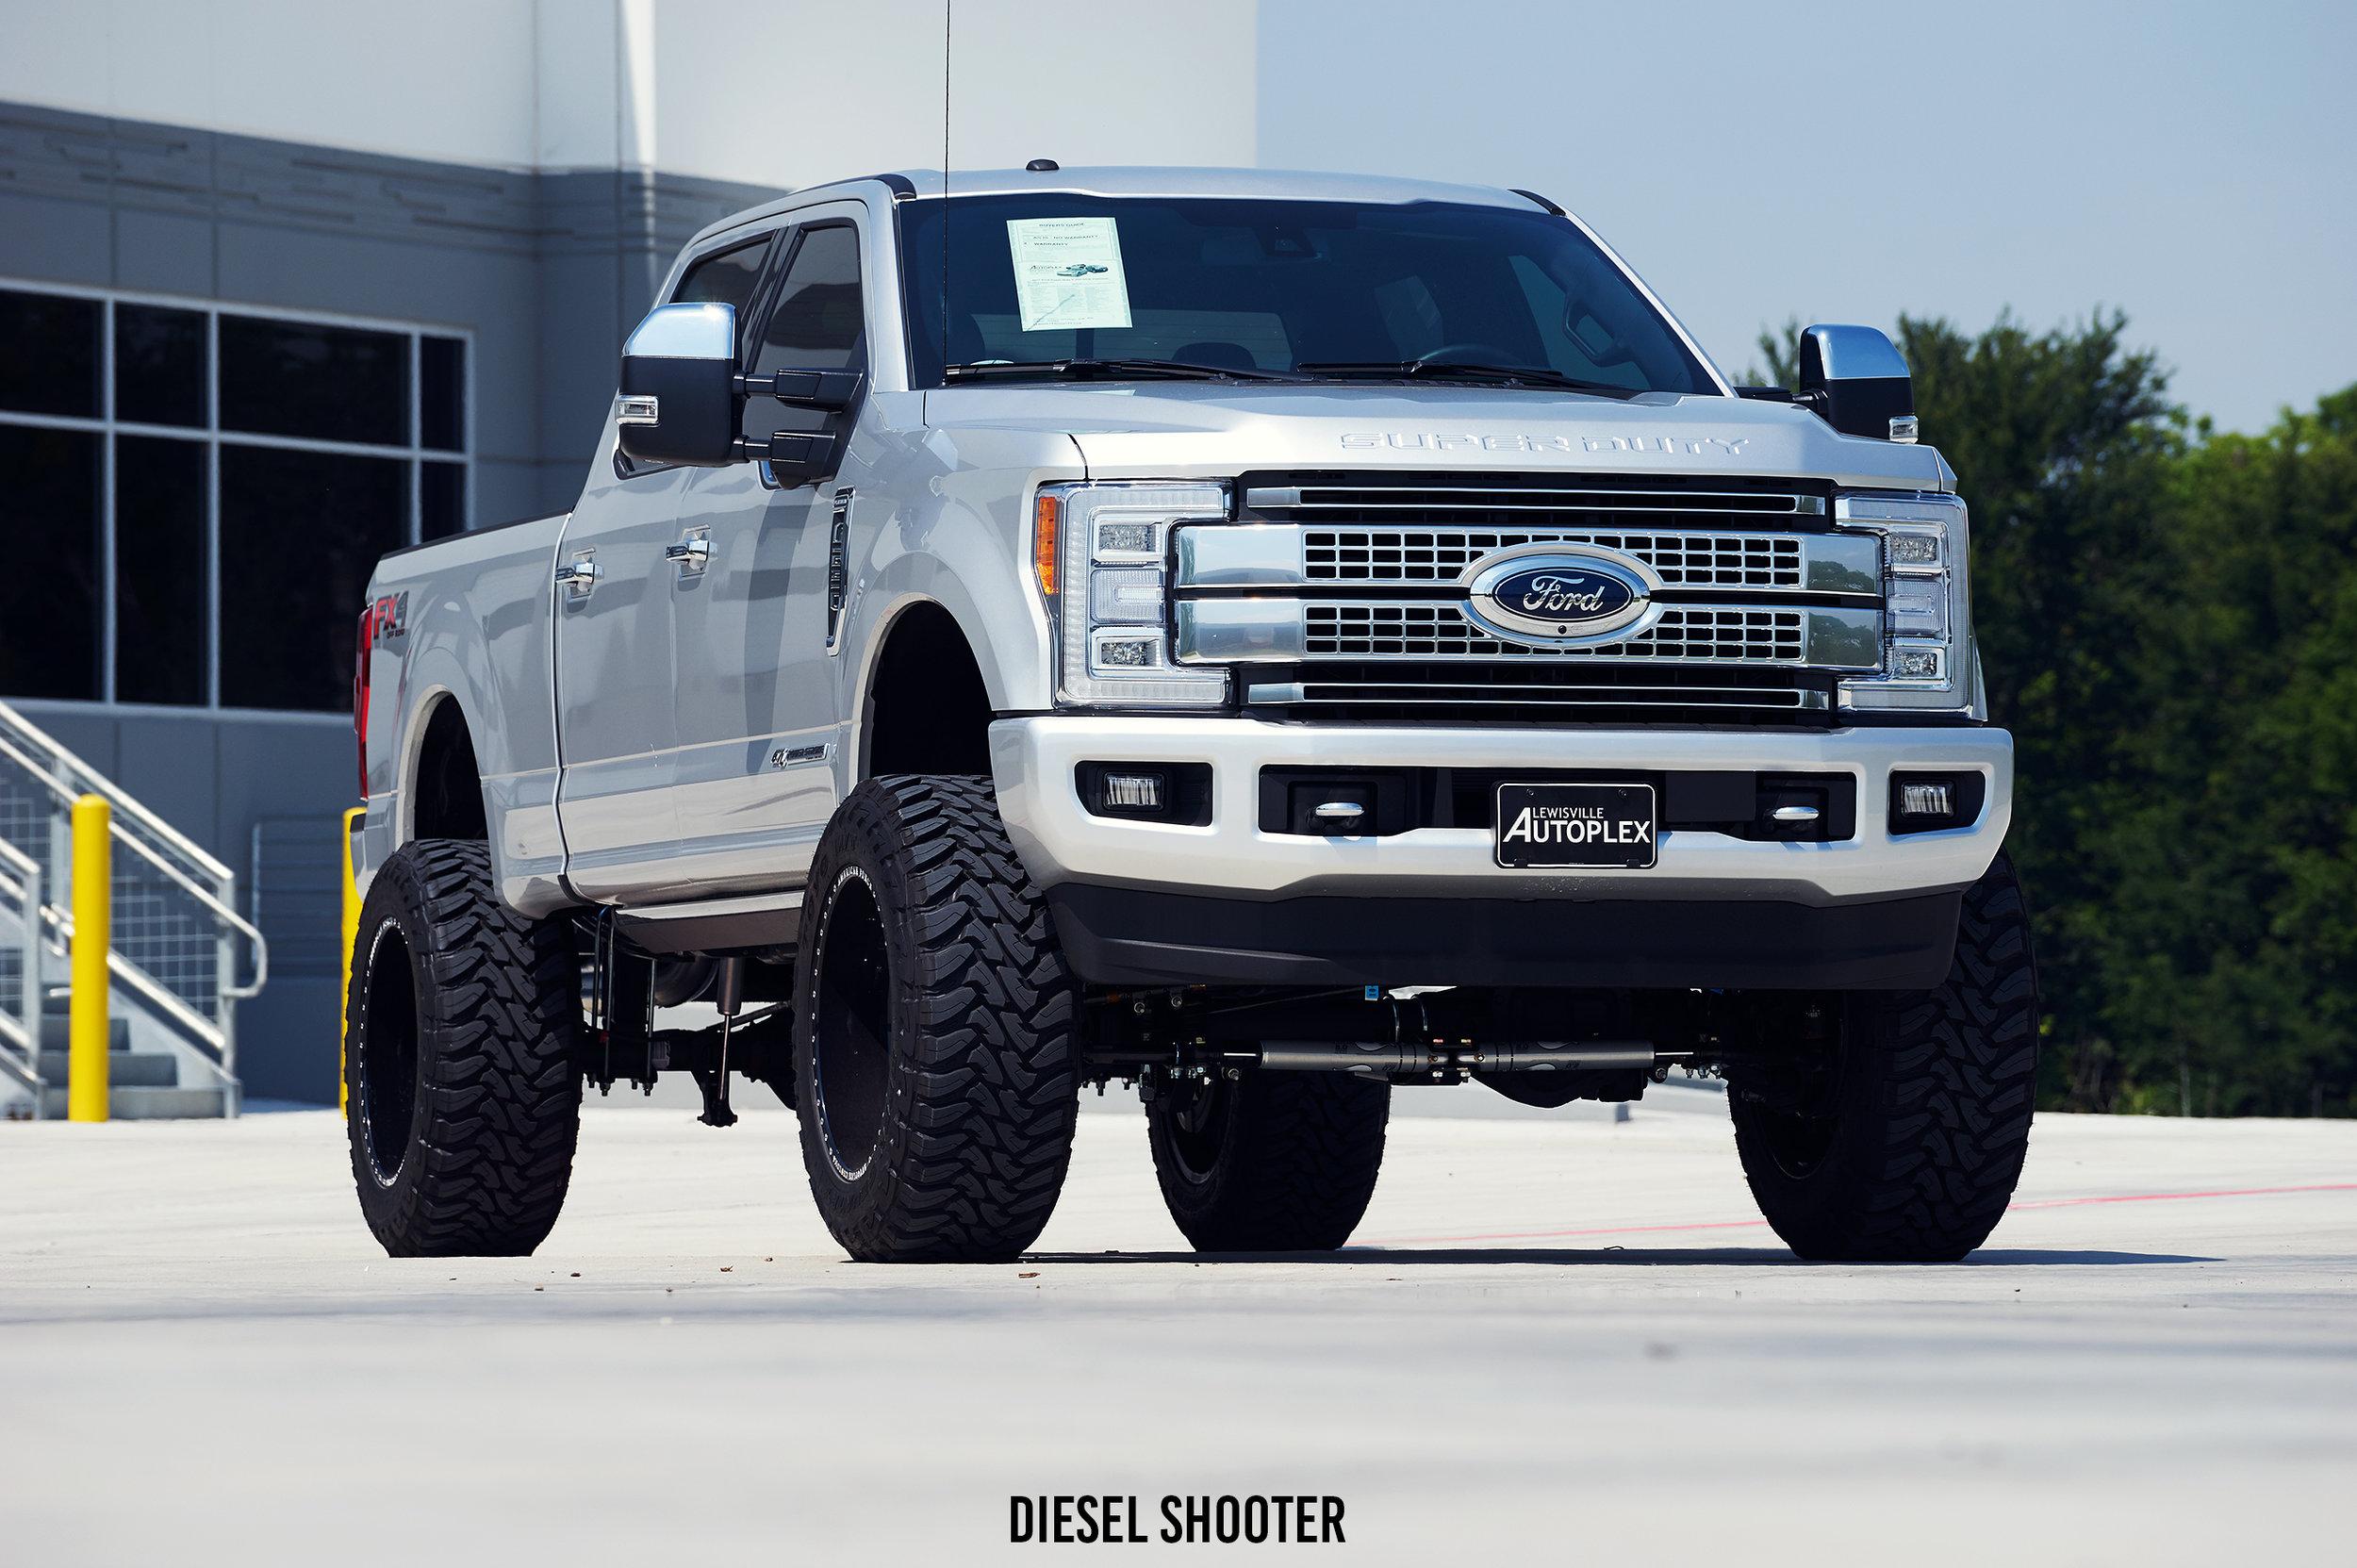 2017 Ford F250 Platinum Fuel Off Road Fts Diesel Shooter